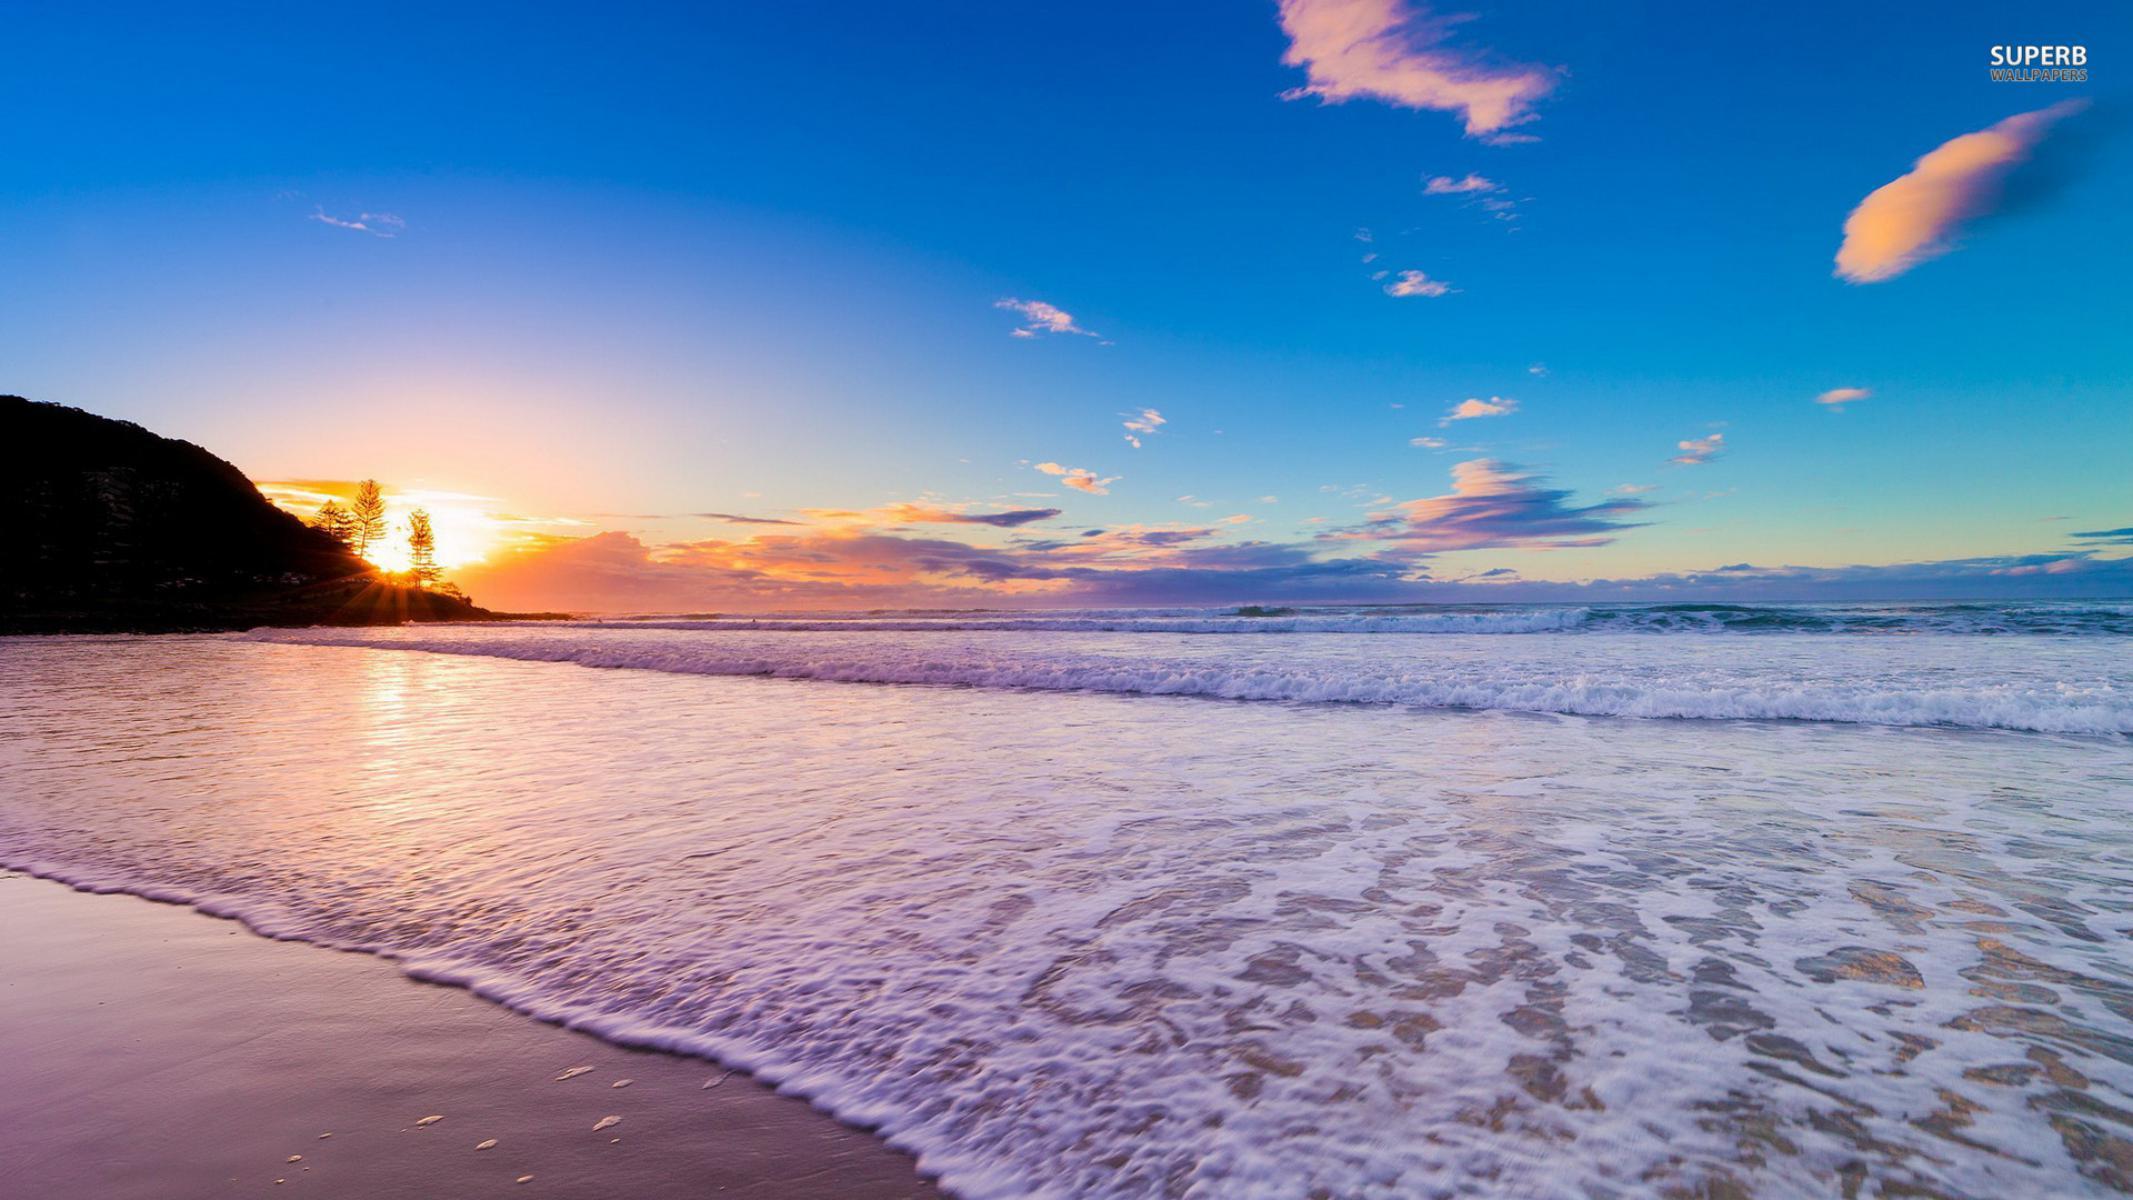 Sfondi desktop tramonti for Sfondi desktop tramonti mare